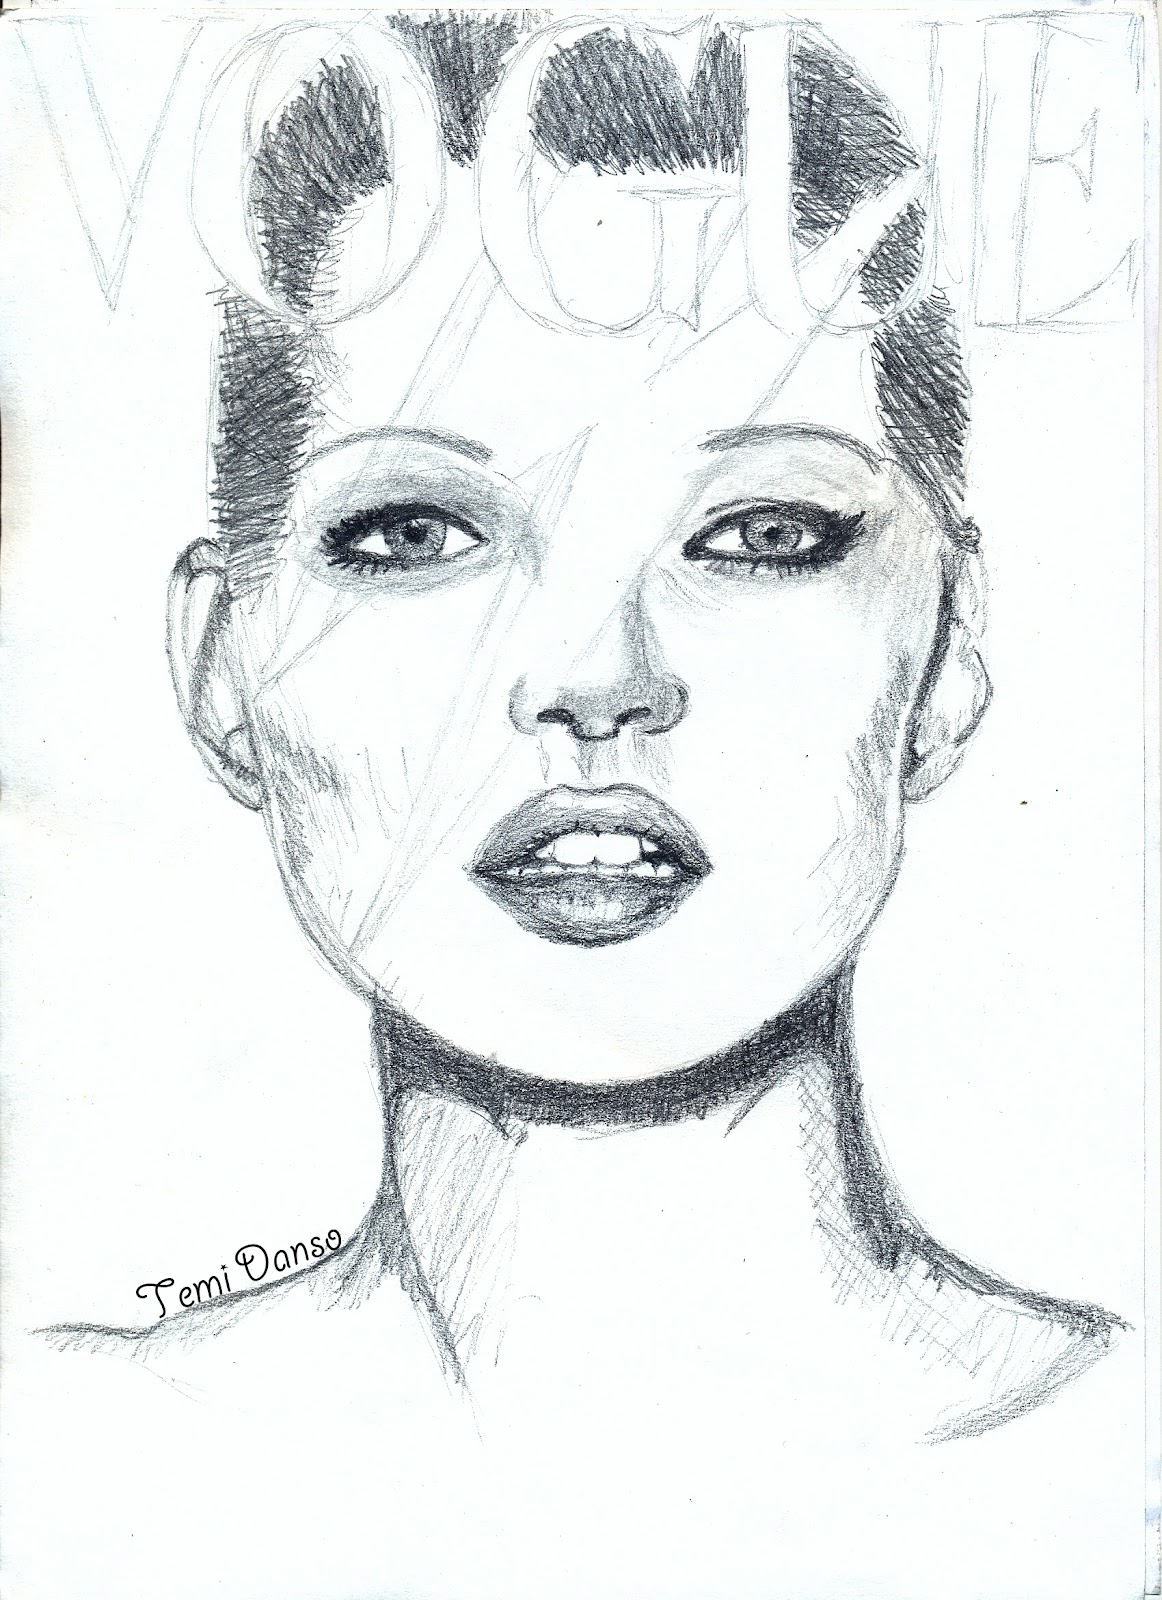 http://2.bp.blogspot.com/-GYRh4OHCT8A/T5xELaZv_mI/AAAAAAAAAJQ/imaf0brUoaw/s1600/Kate+Moss+WIP.jpg